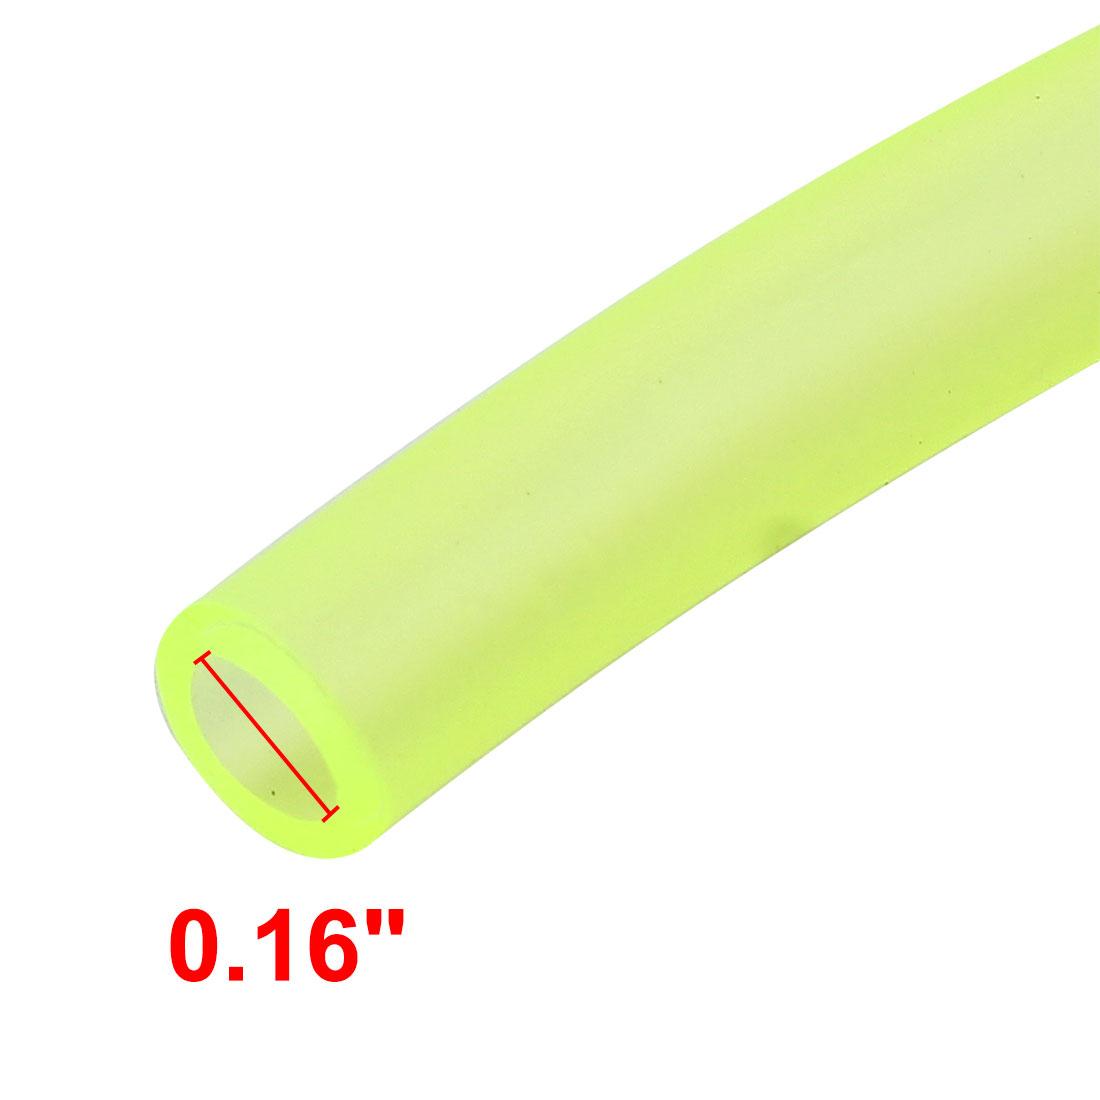 Aquarium PVC 3 Way Air Valve Pipe Oxygen Circulate  Green 4.4M Length - image 2 de 3